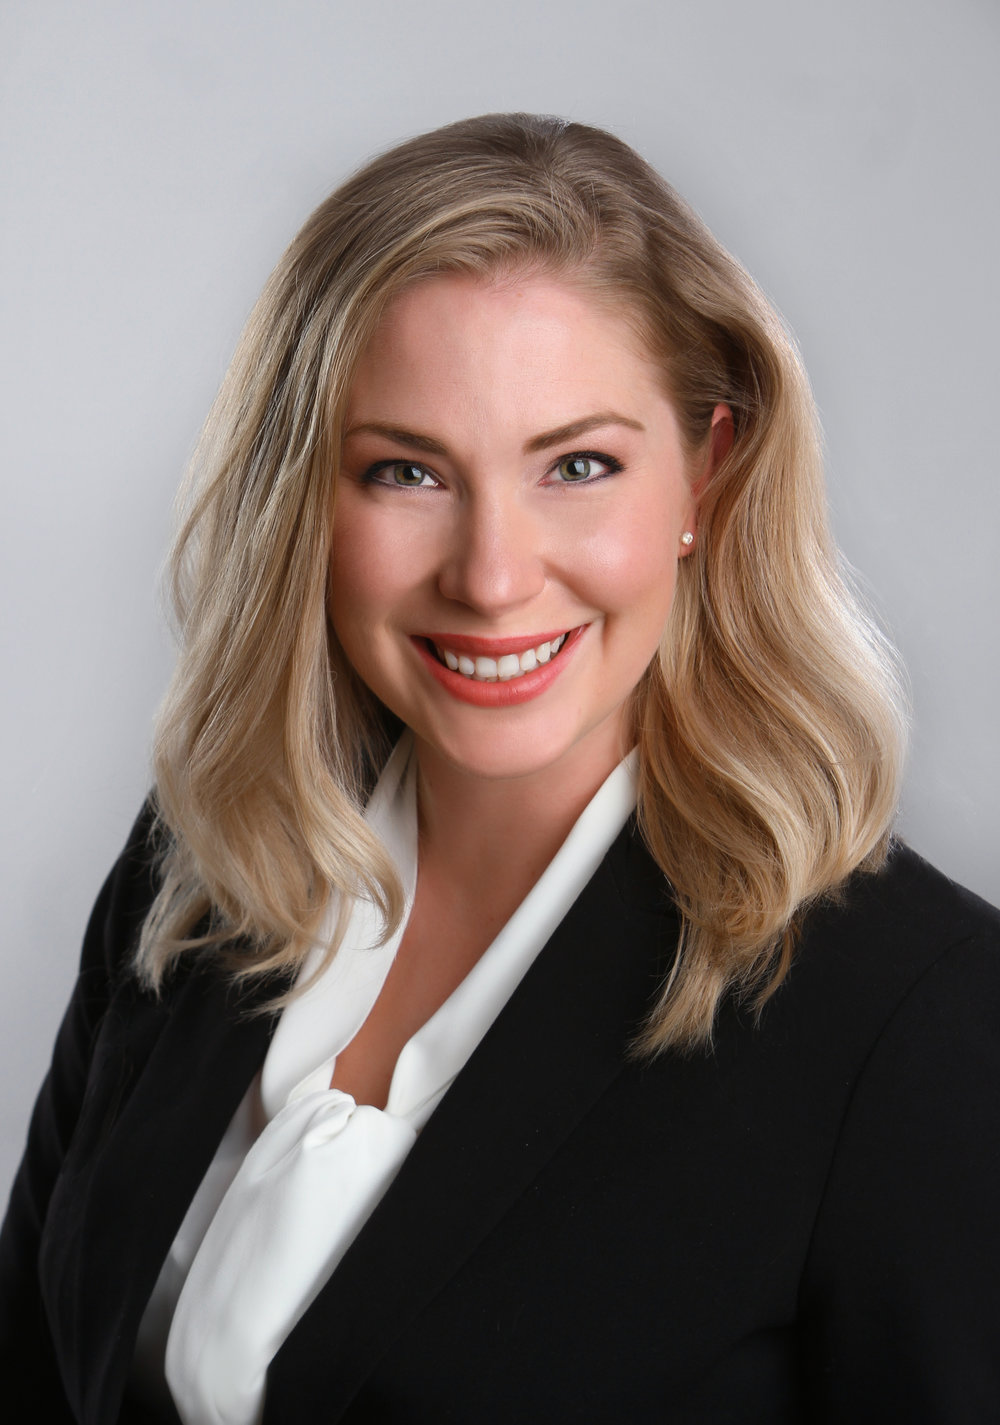 Ashlie M. Caronia, Spokane Dermatology Clinic